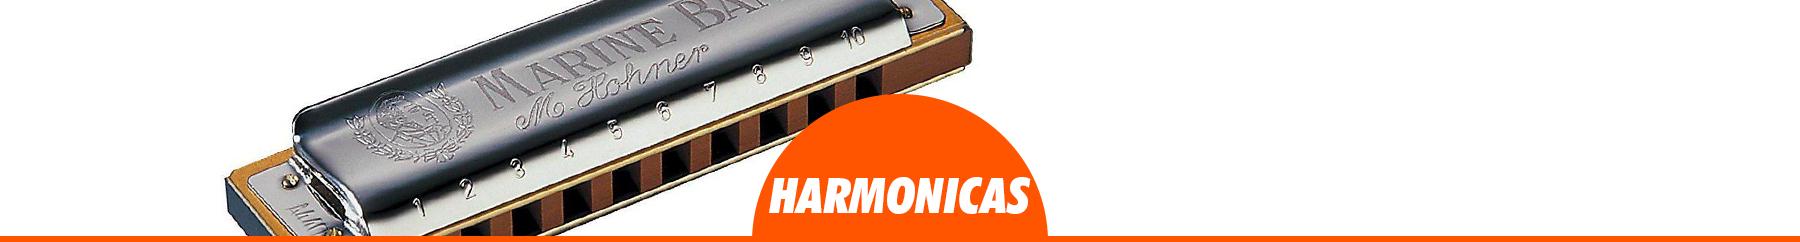 Harmonicas & Whistles